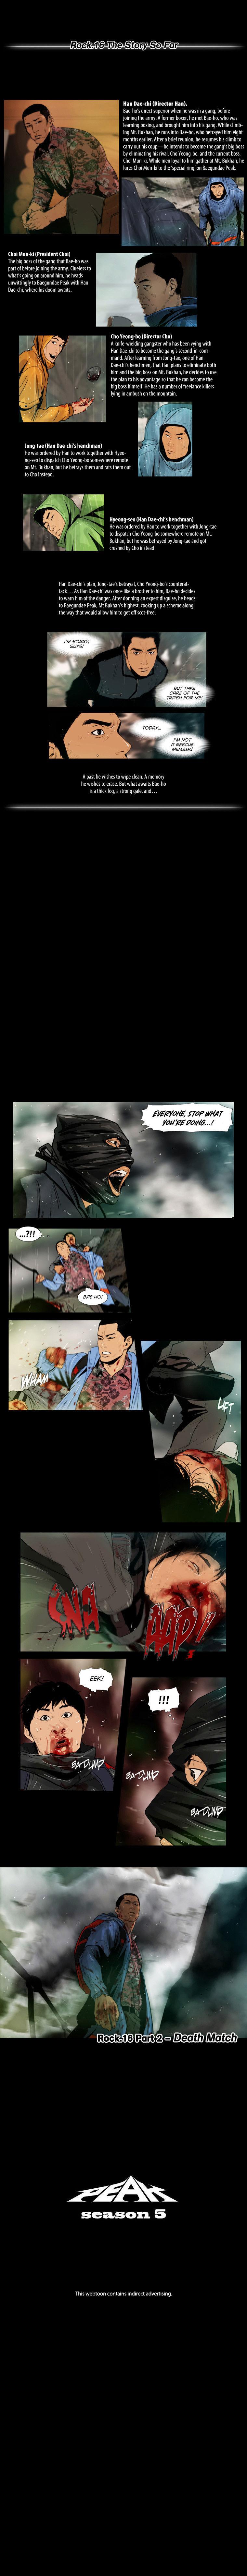 Peak (Im Gang-hyeok) 79 Page 2